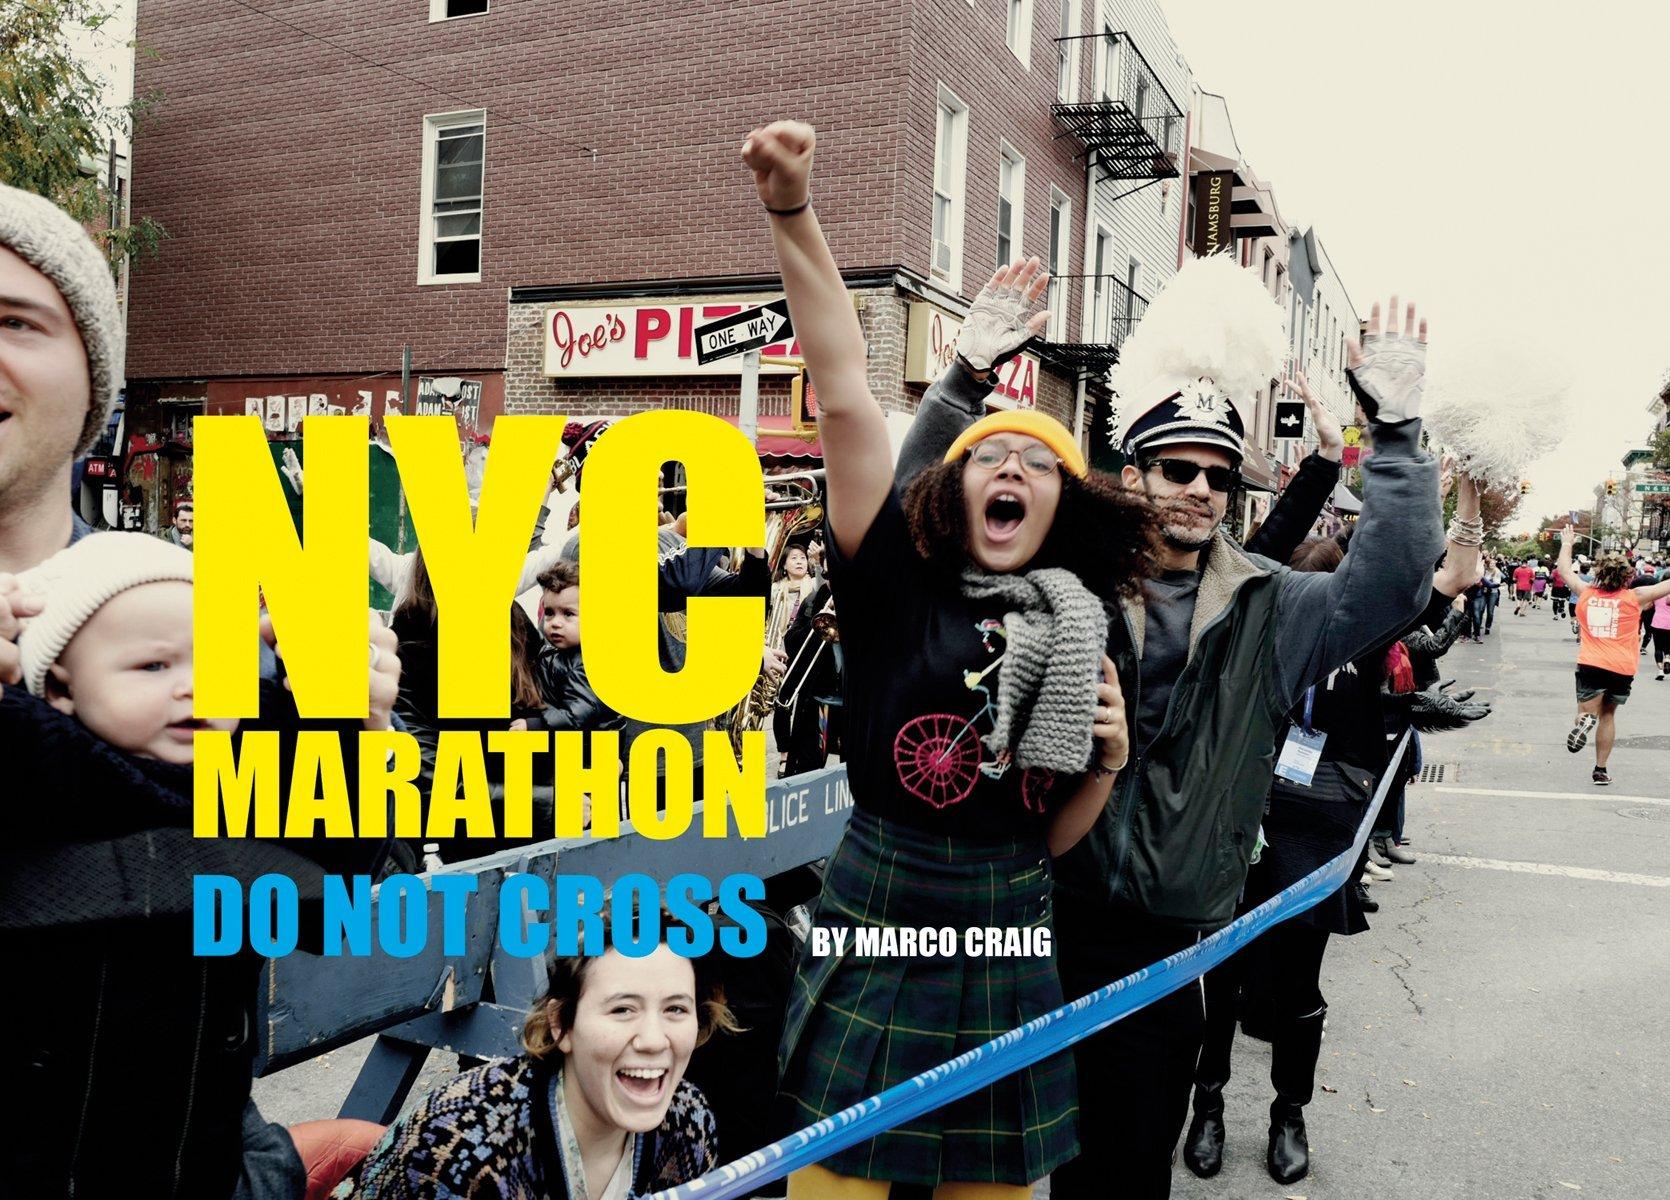 NYC Marathon: Photographs by Marco Craig: Do Not Cross